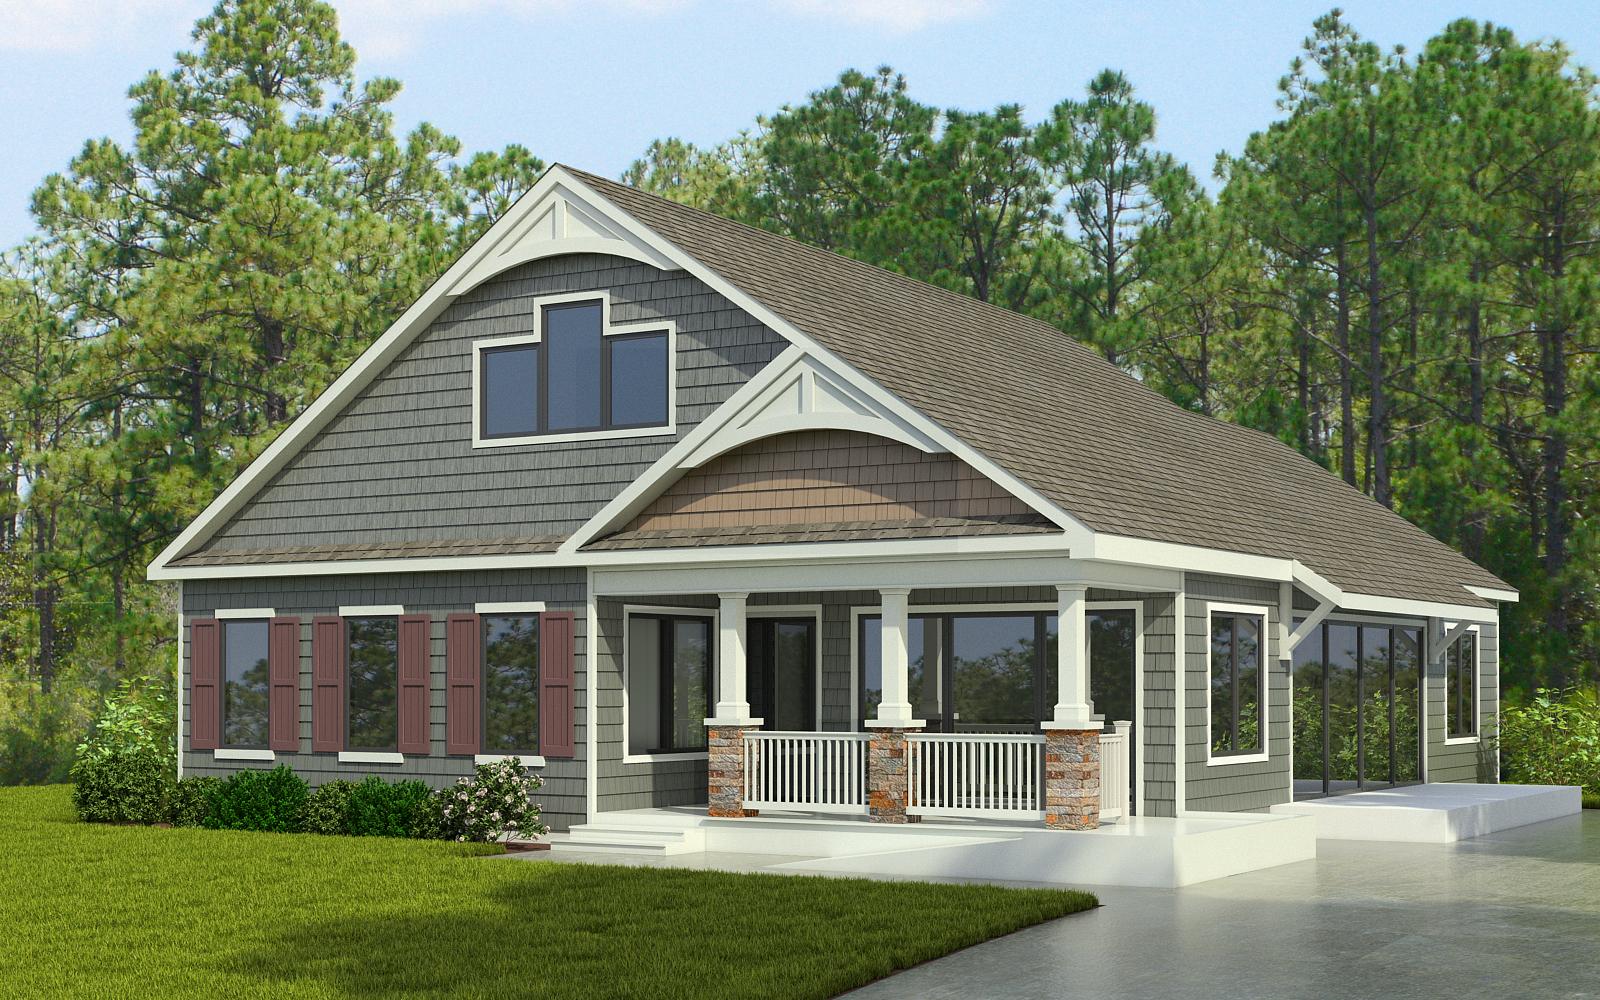 Jim Chapman Communities 55 Home Is Top Draw At 2017 IBS